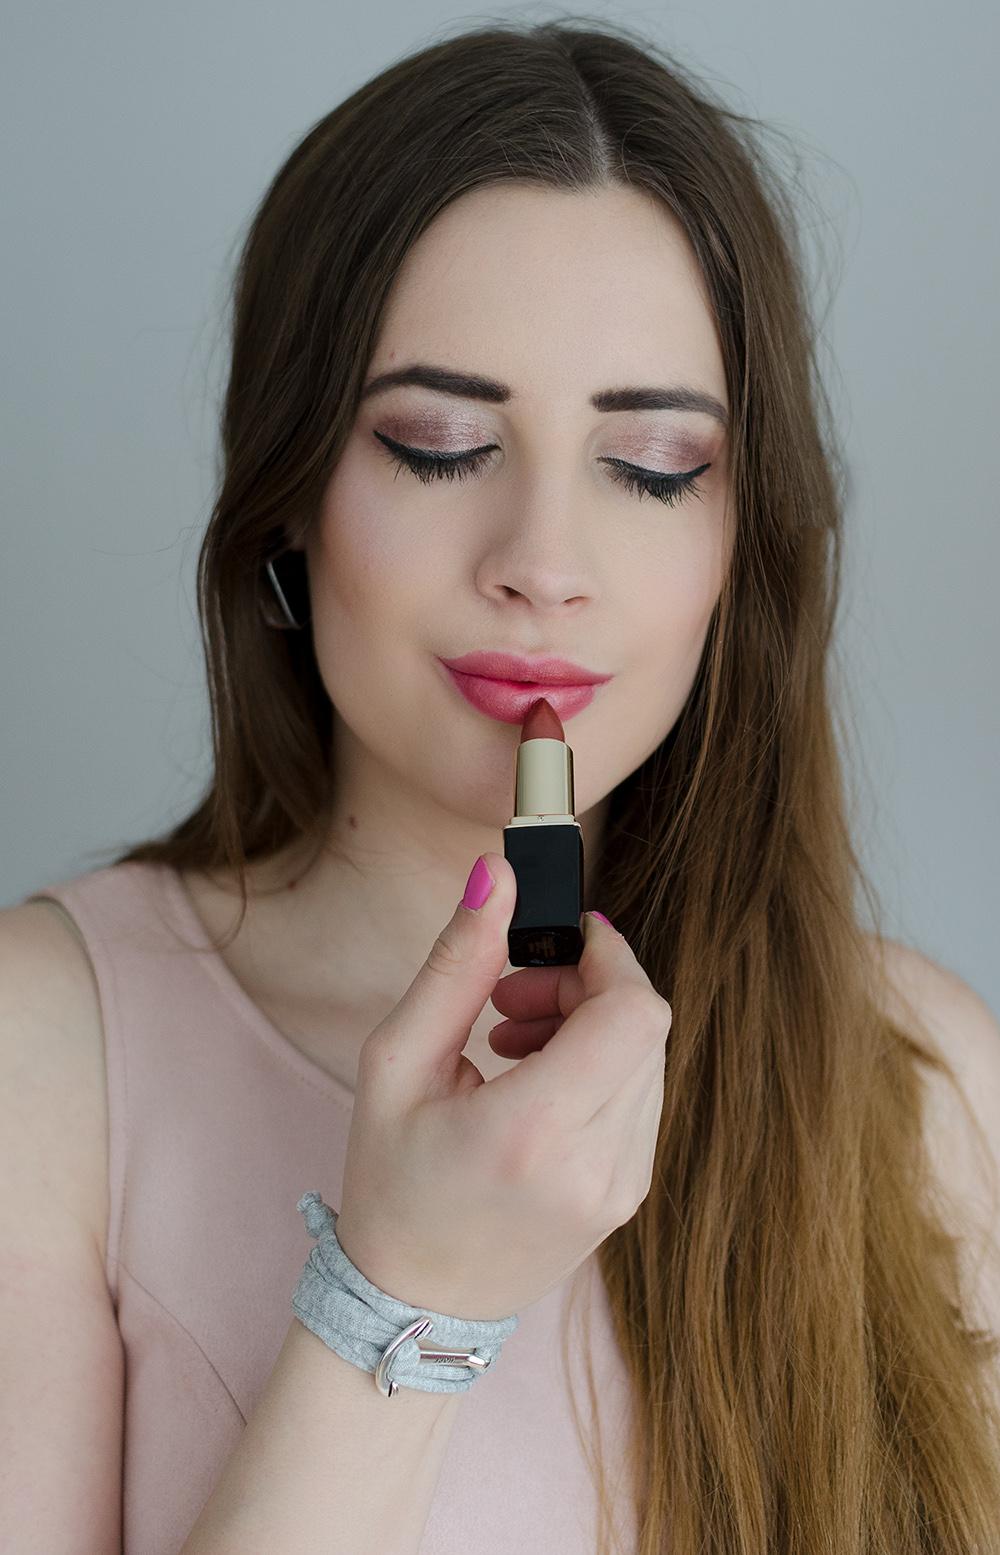 andysparkles-beautyblogger-beauty-influencer-beautypress-box-2017